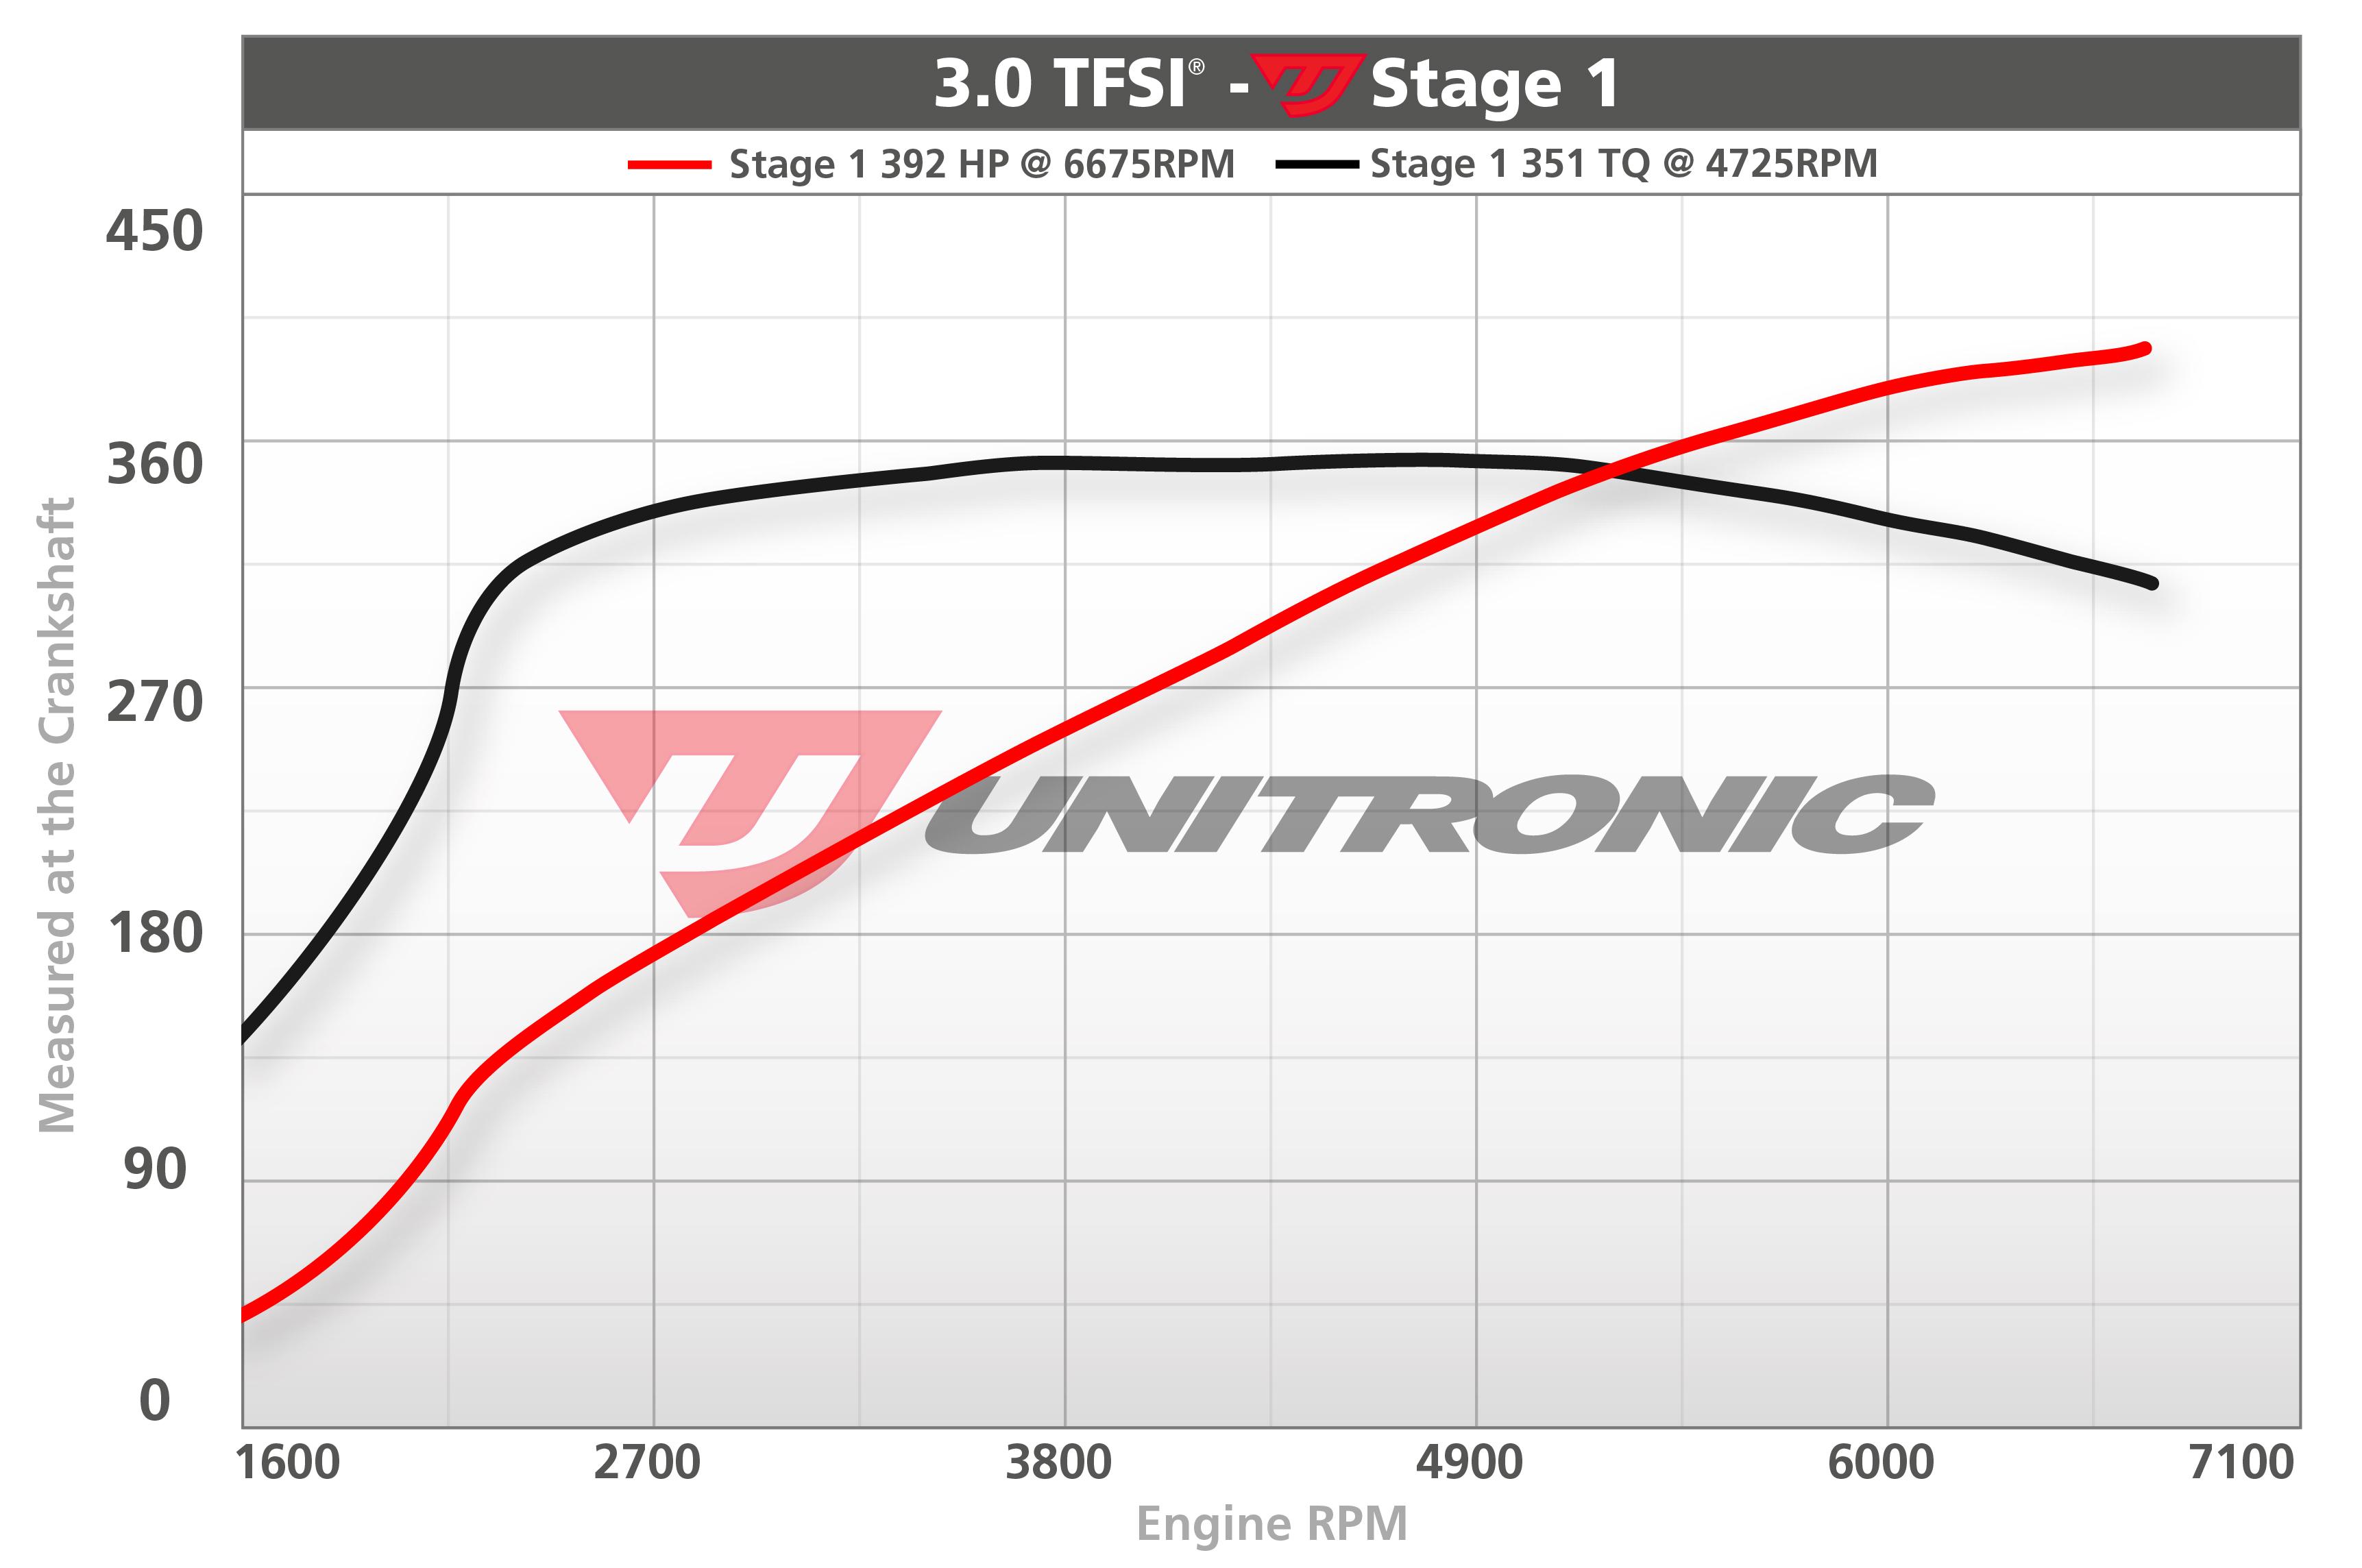 Audi A6 3 2 Engine Diagram Modern Design Of Wiring Tfsi Library Rh 49 Budoshop4you De Deisel Quattro Parts Schematic